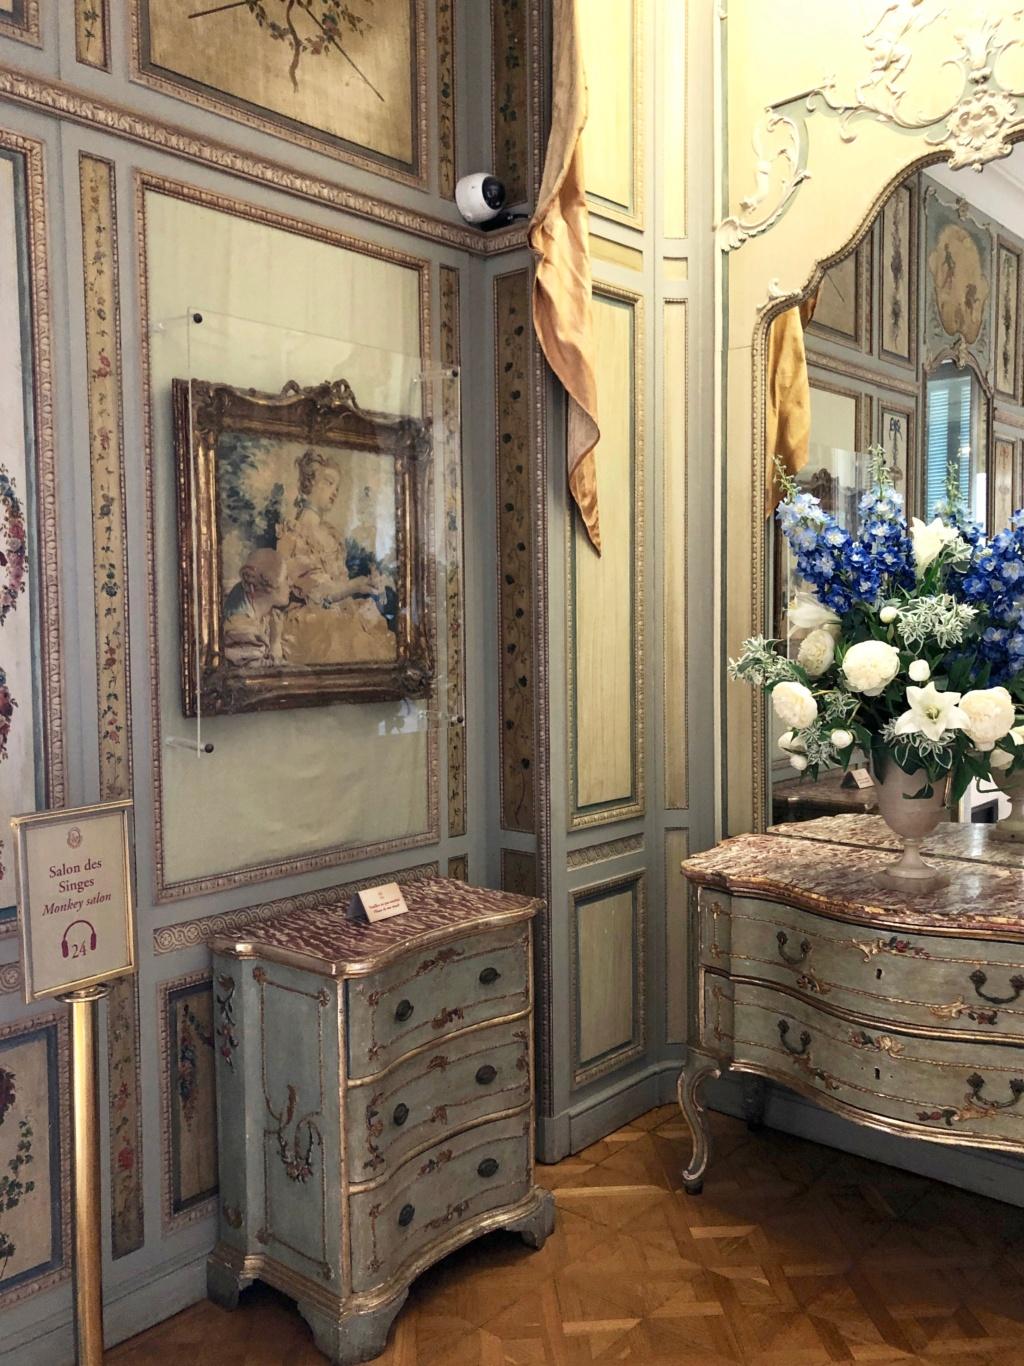 La Villa Ephrussi de Rothschild - Page 3 Img_0927